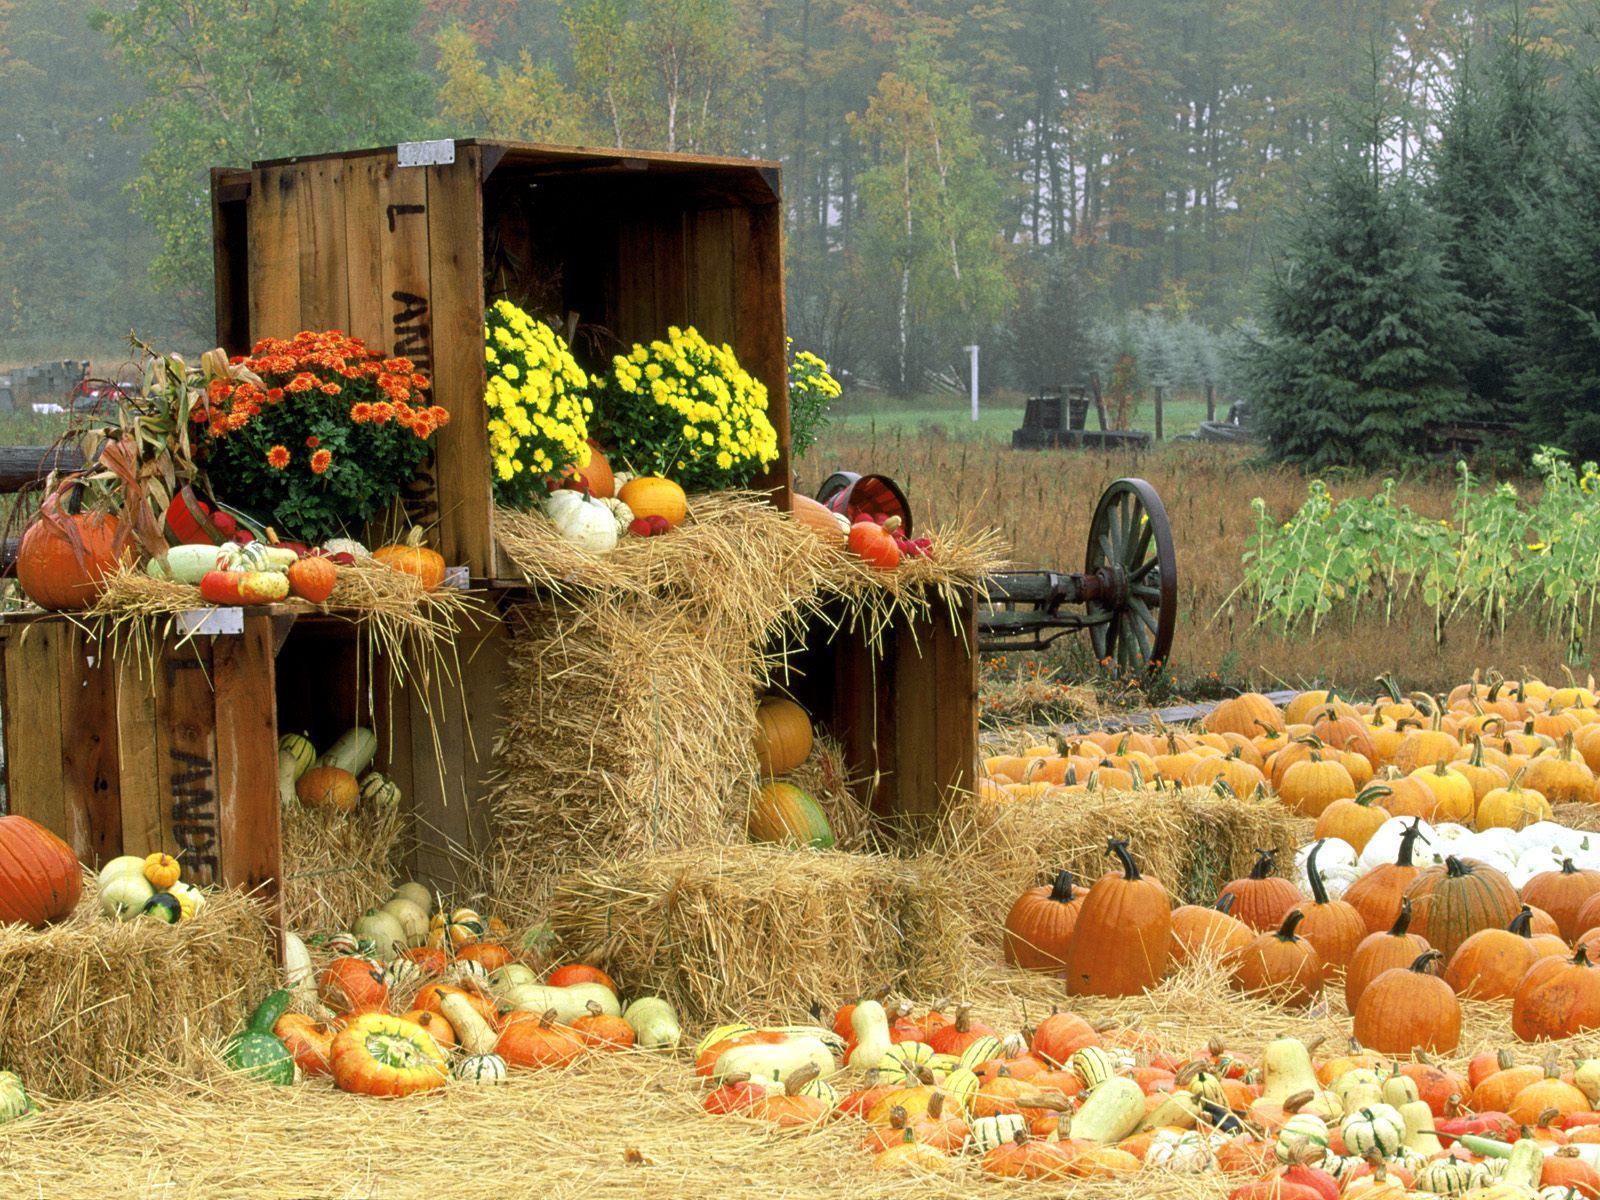 1000+ images about Autumn on Pinterest   Nature, Rain and Autumn